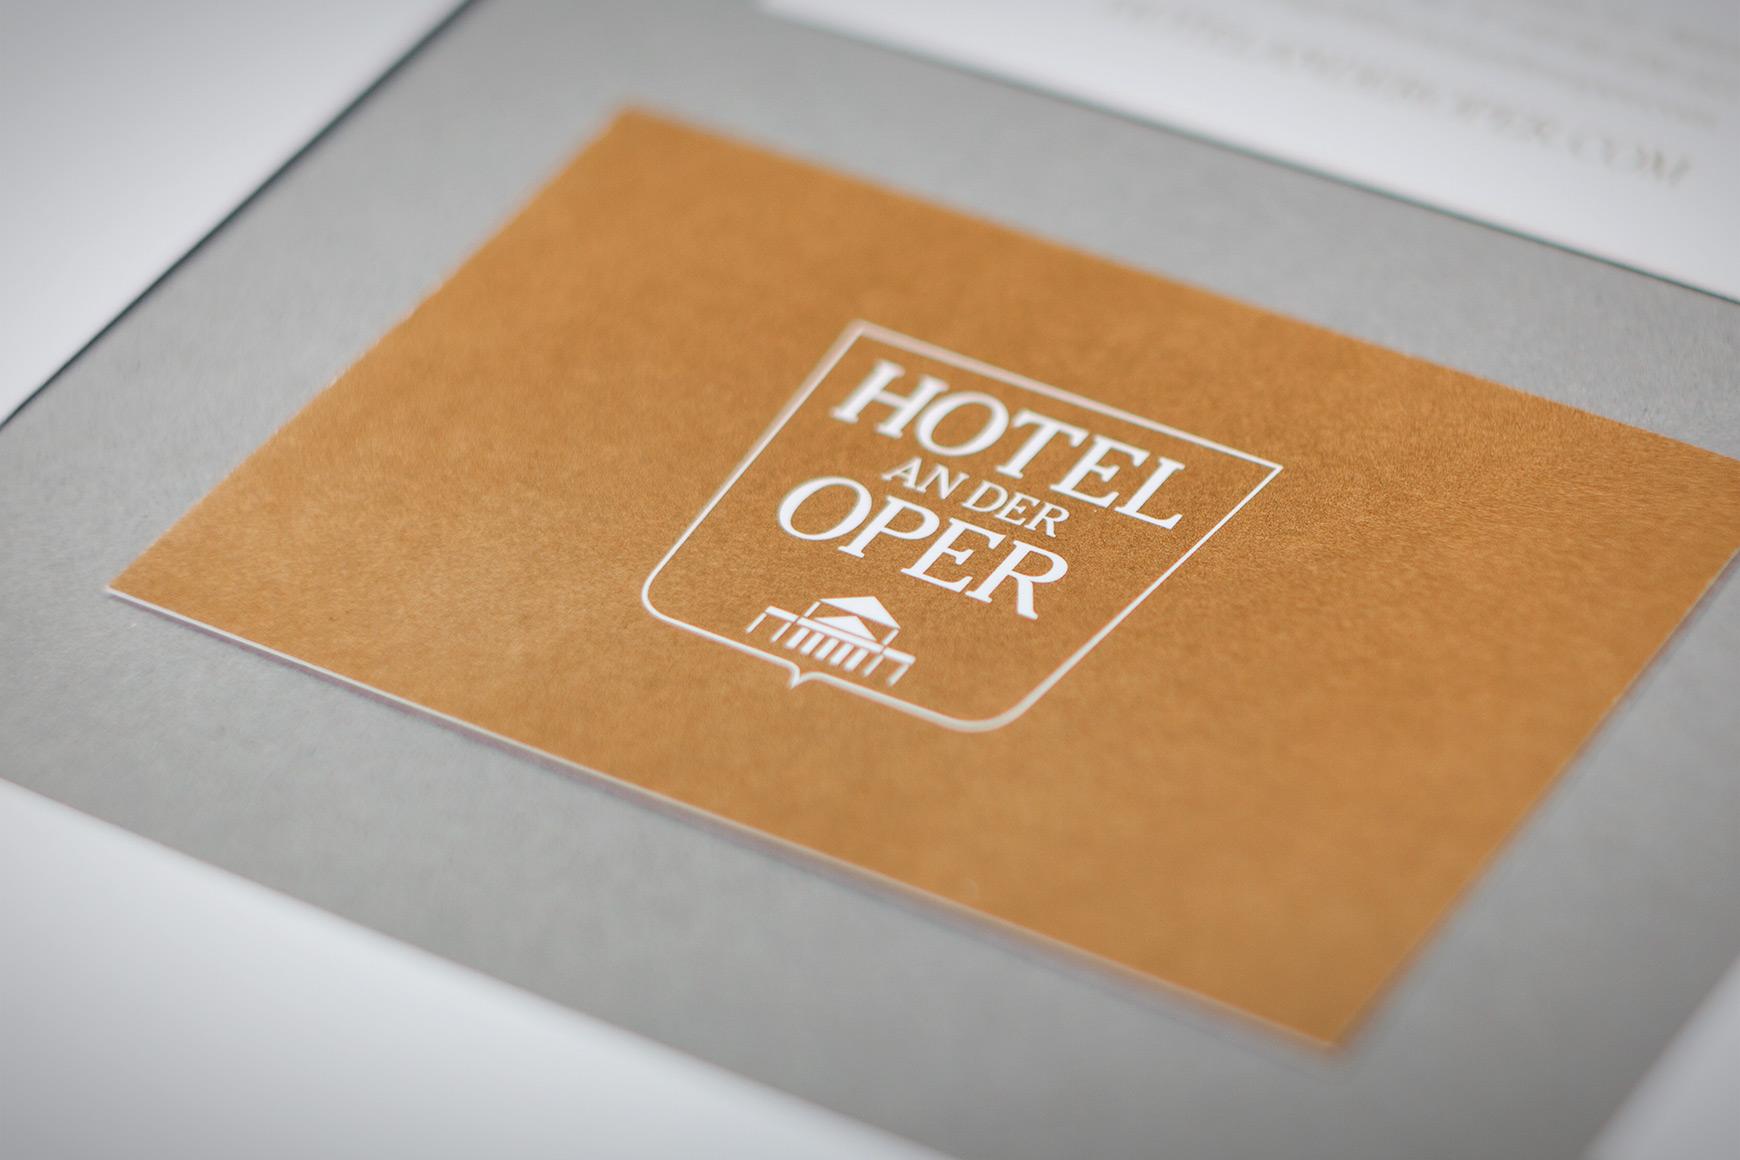 Hotel an der Oper Schaufenster